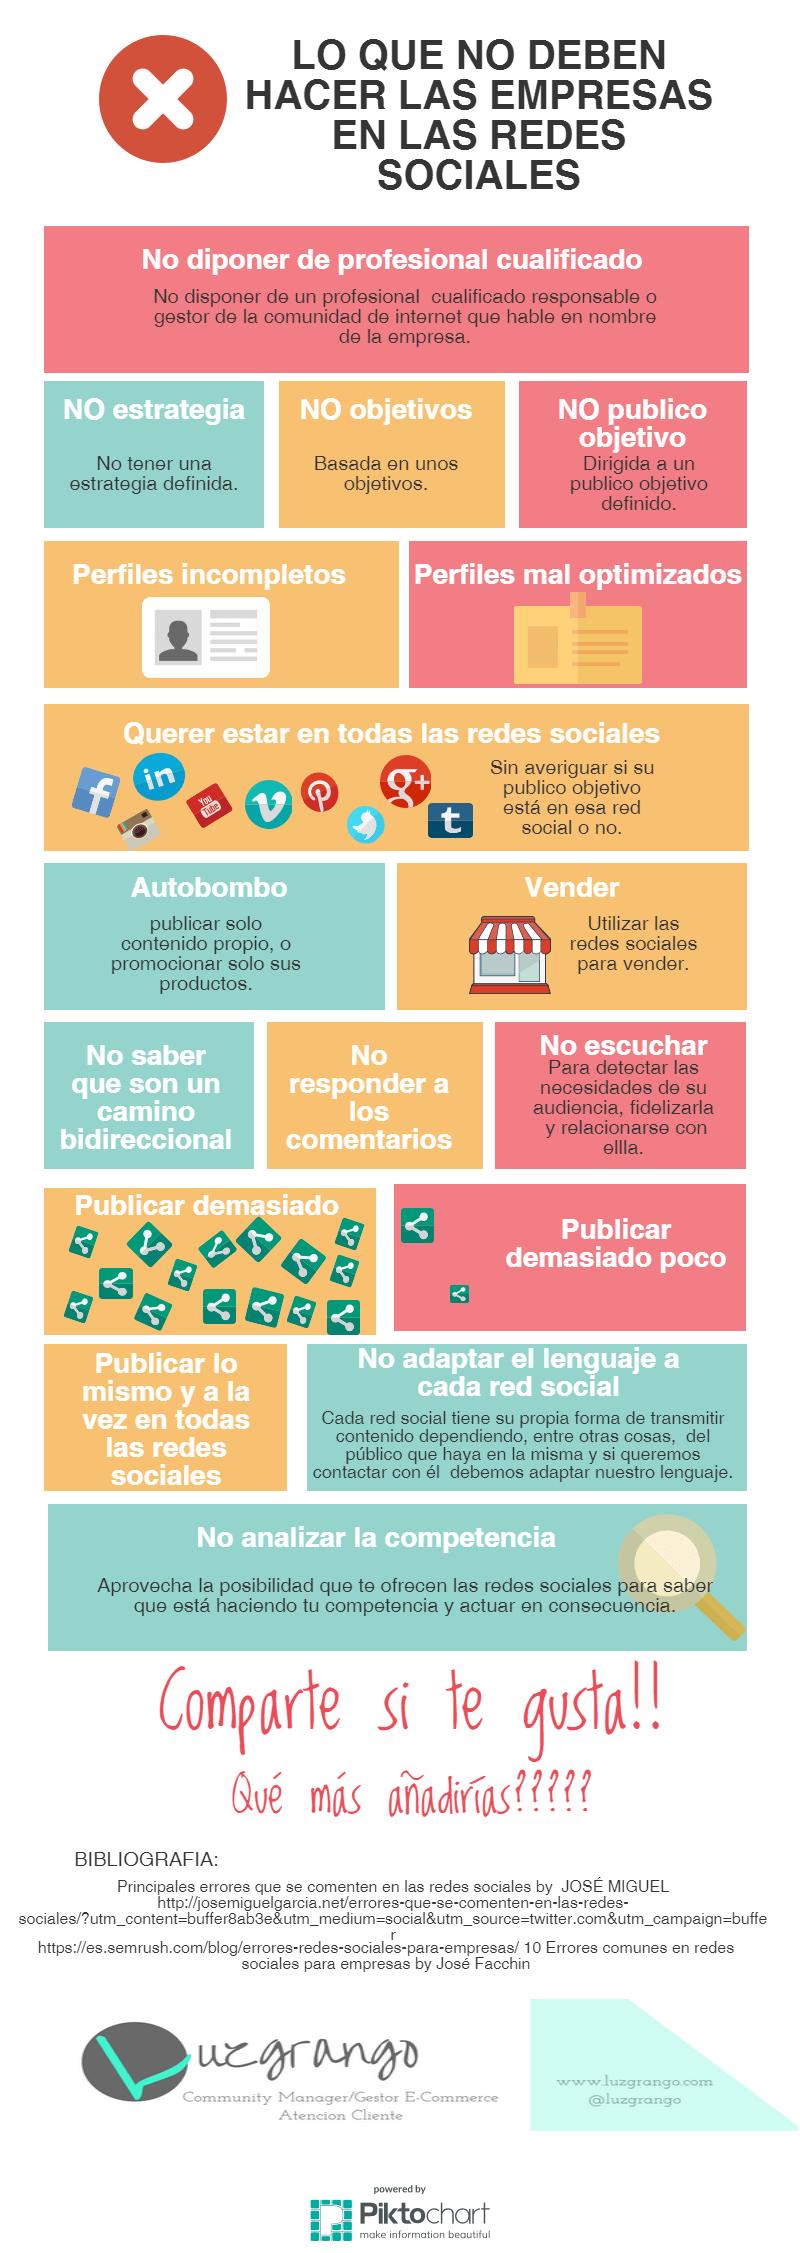 errores-empresas-redes-sociales-infografia.png